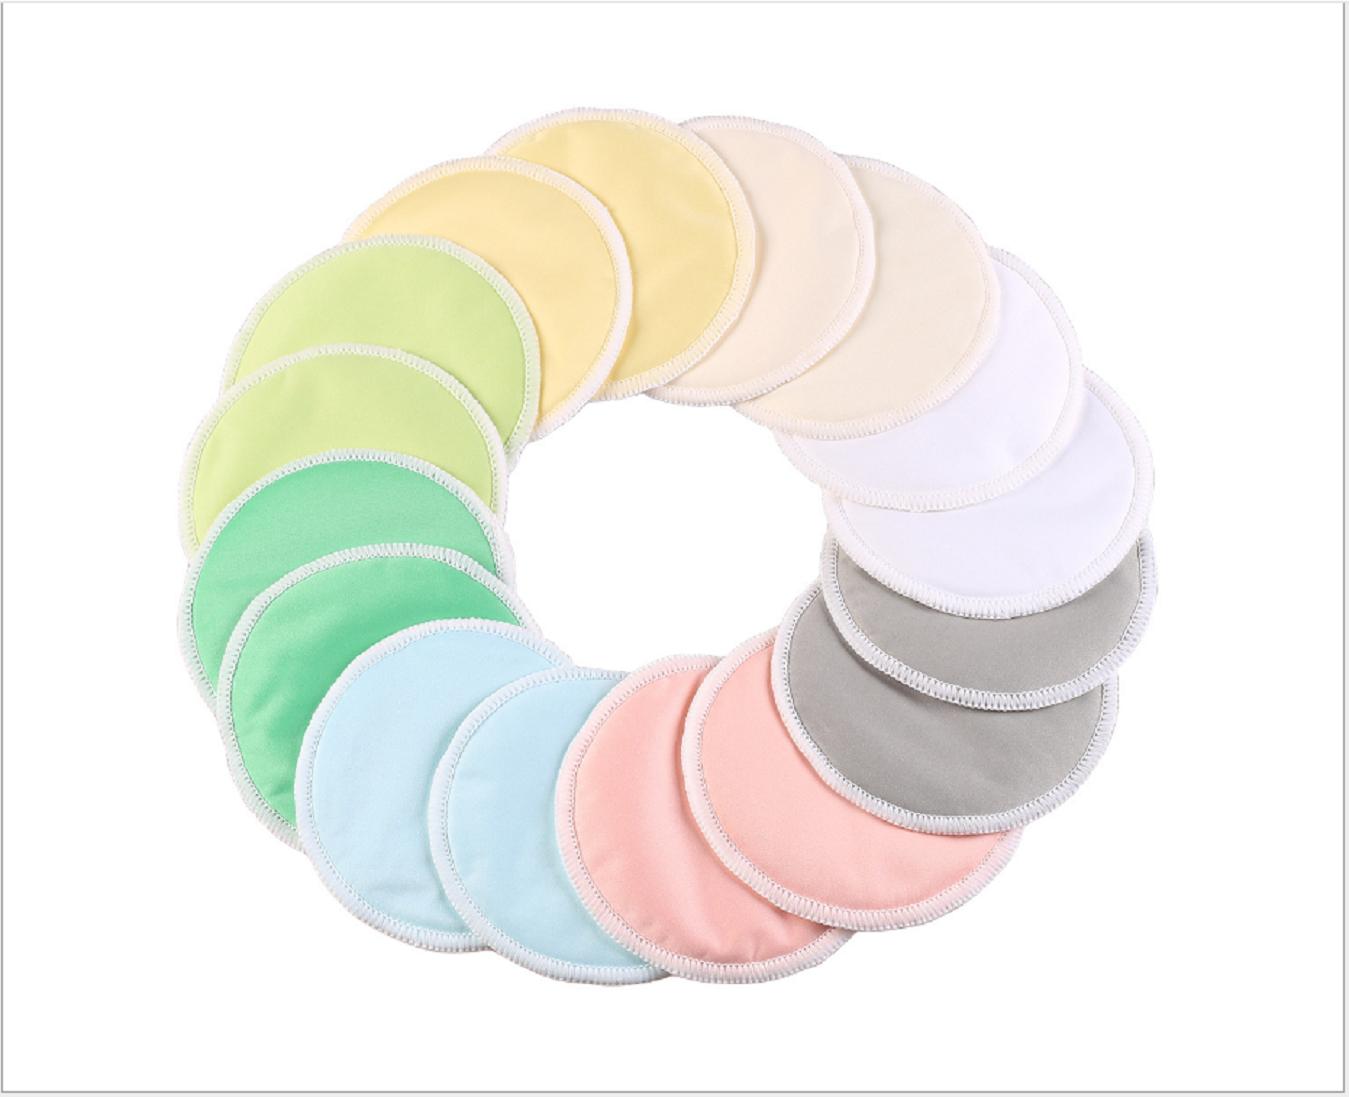 8Pcs Bamboo Reusable Breast Nursing Breastfeeding Washable Soft Organic Pads 2